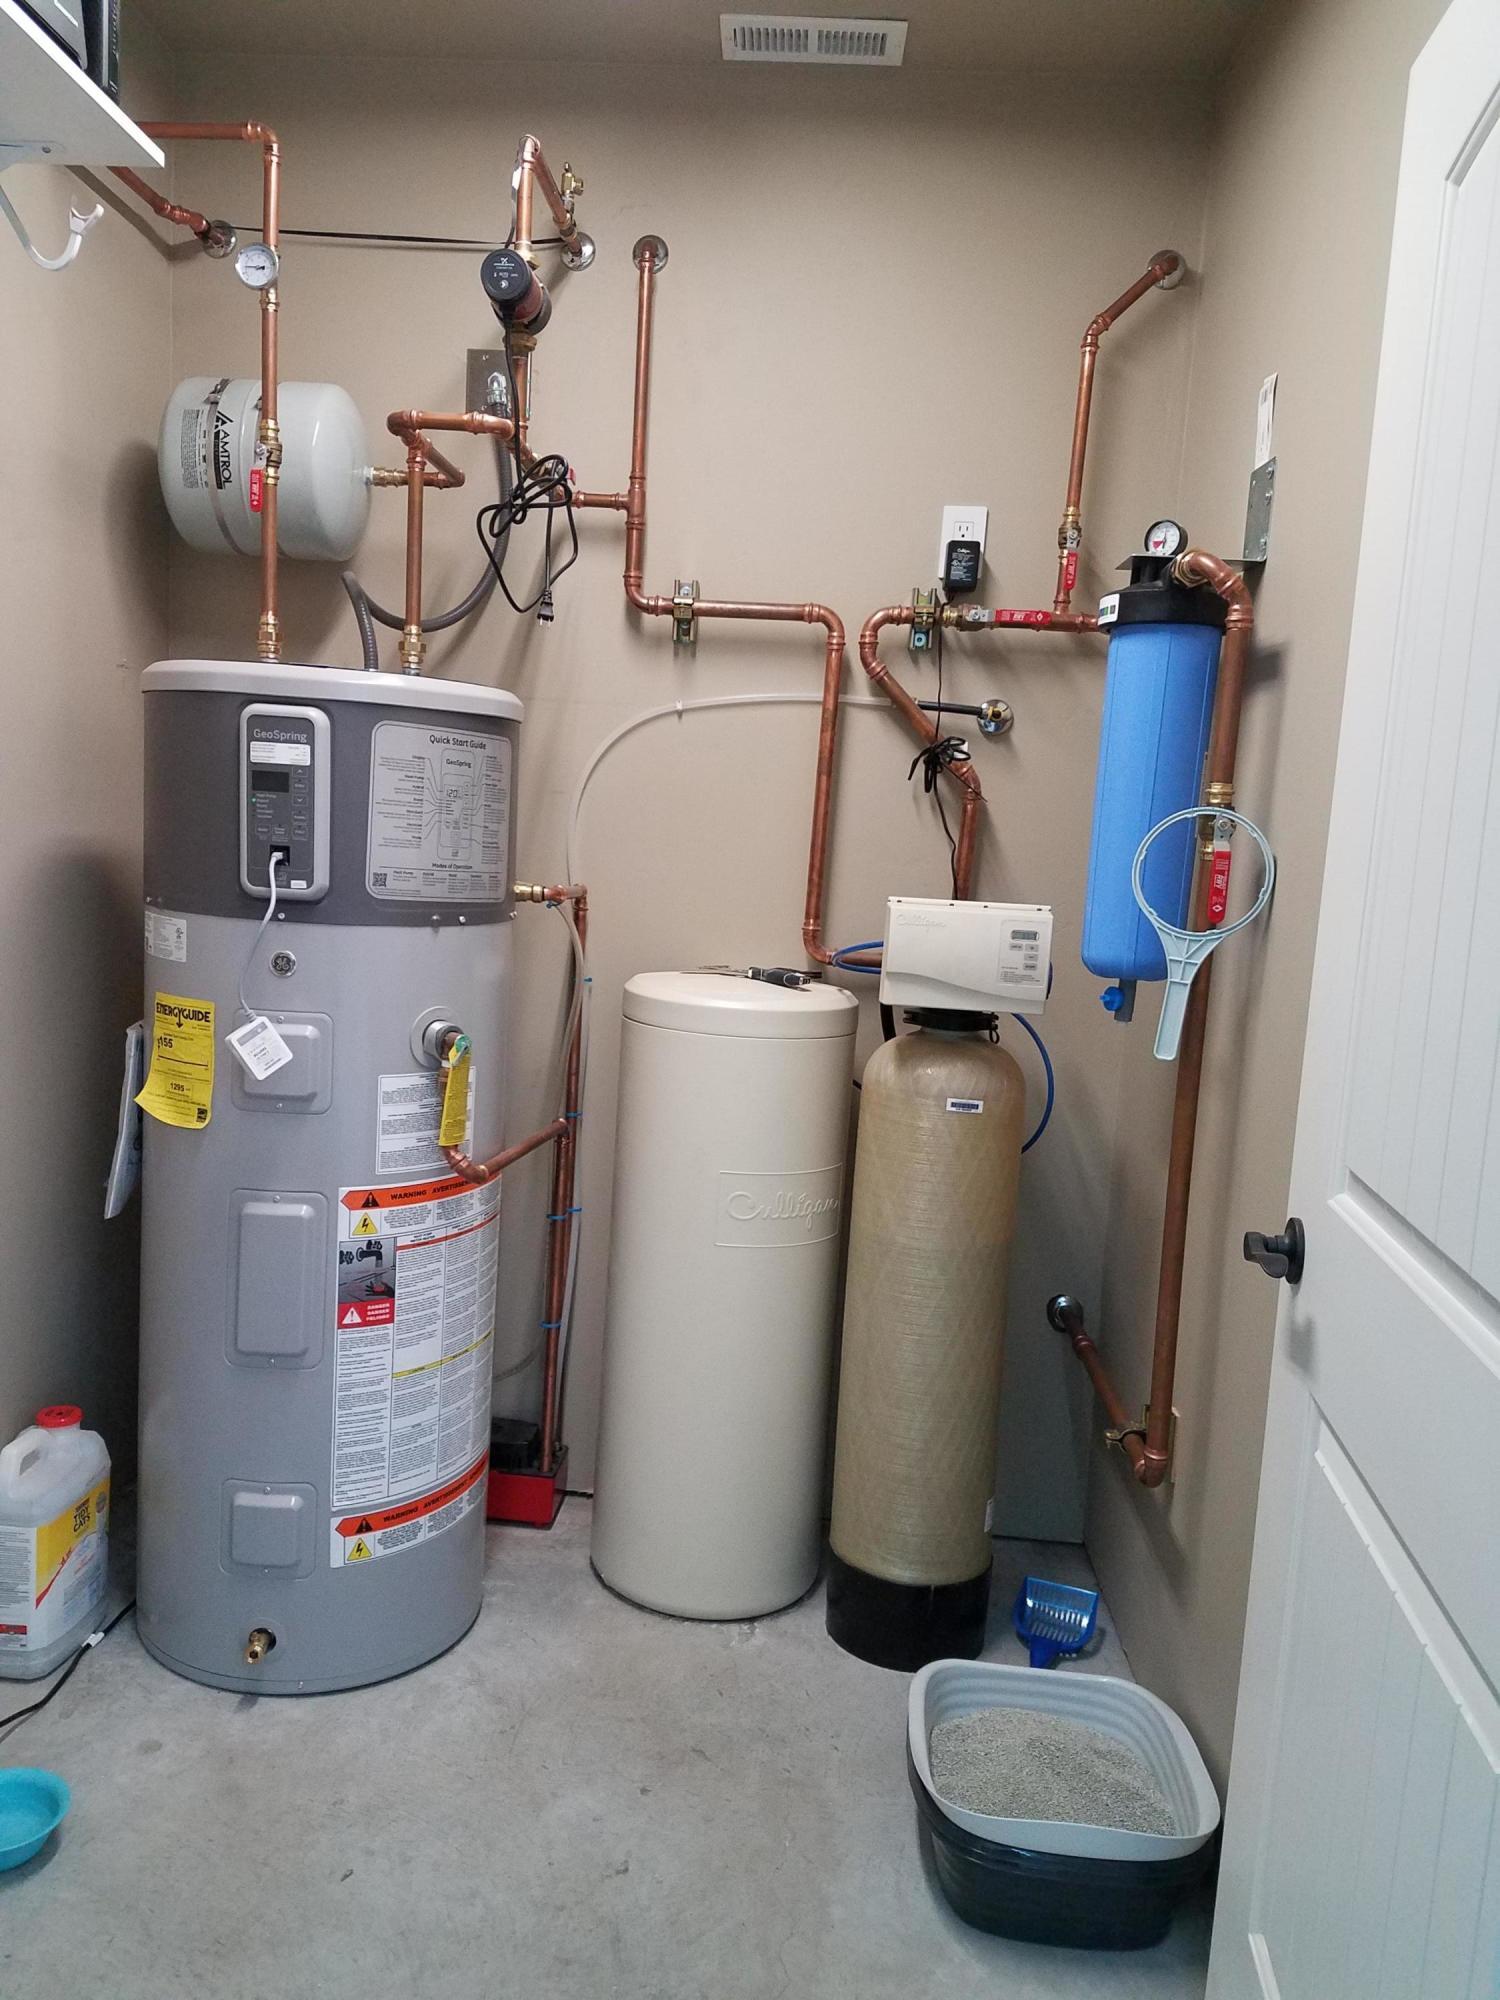 Water heater, filter, softener